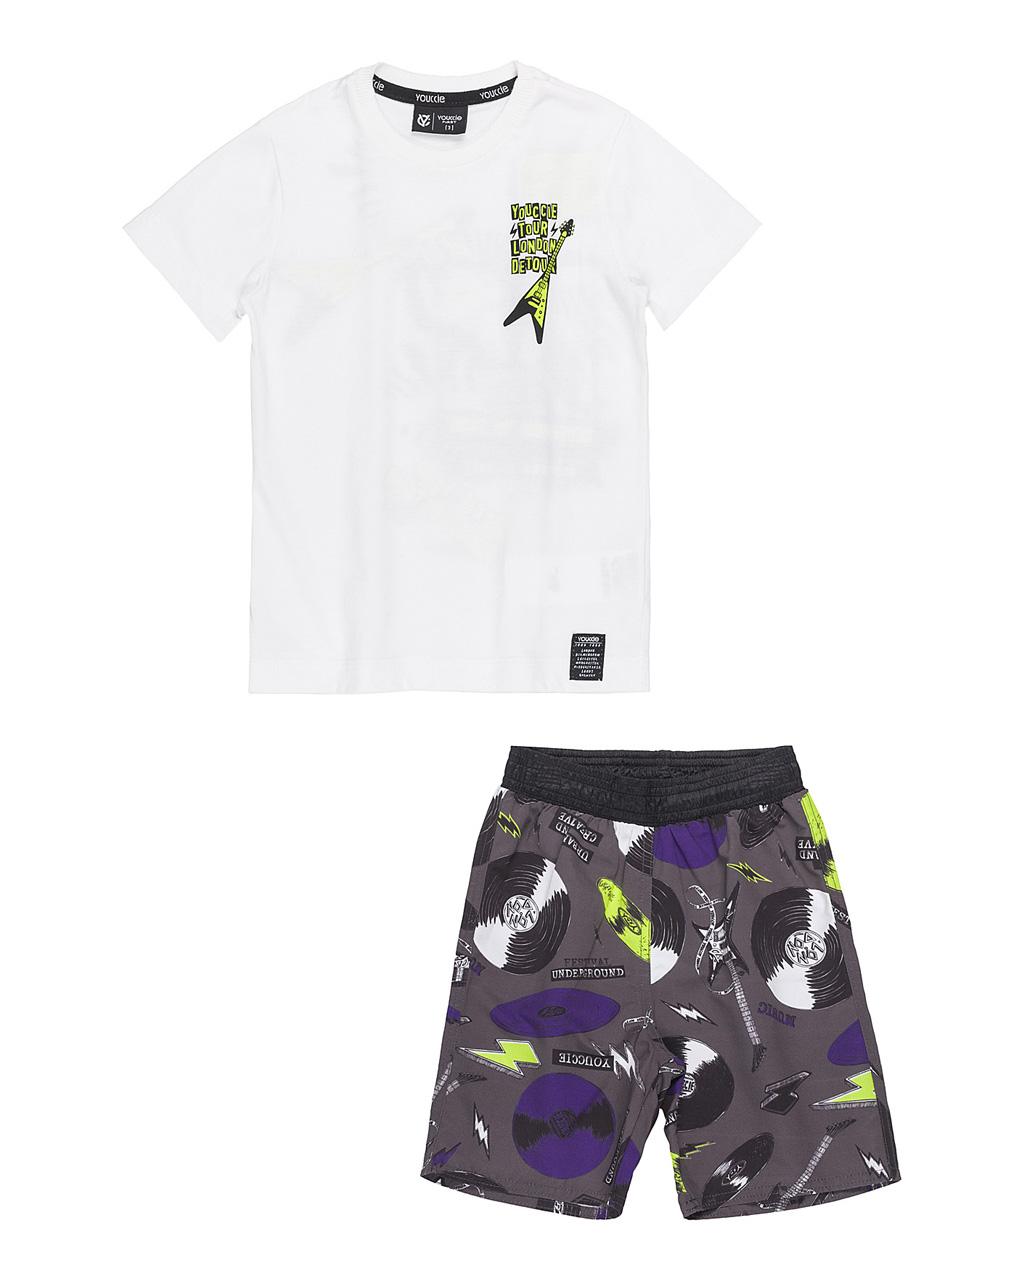 Conjunto First Camiseta Off e Bermuda Tactel Discos Youccie